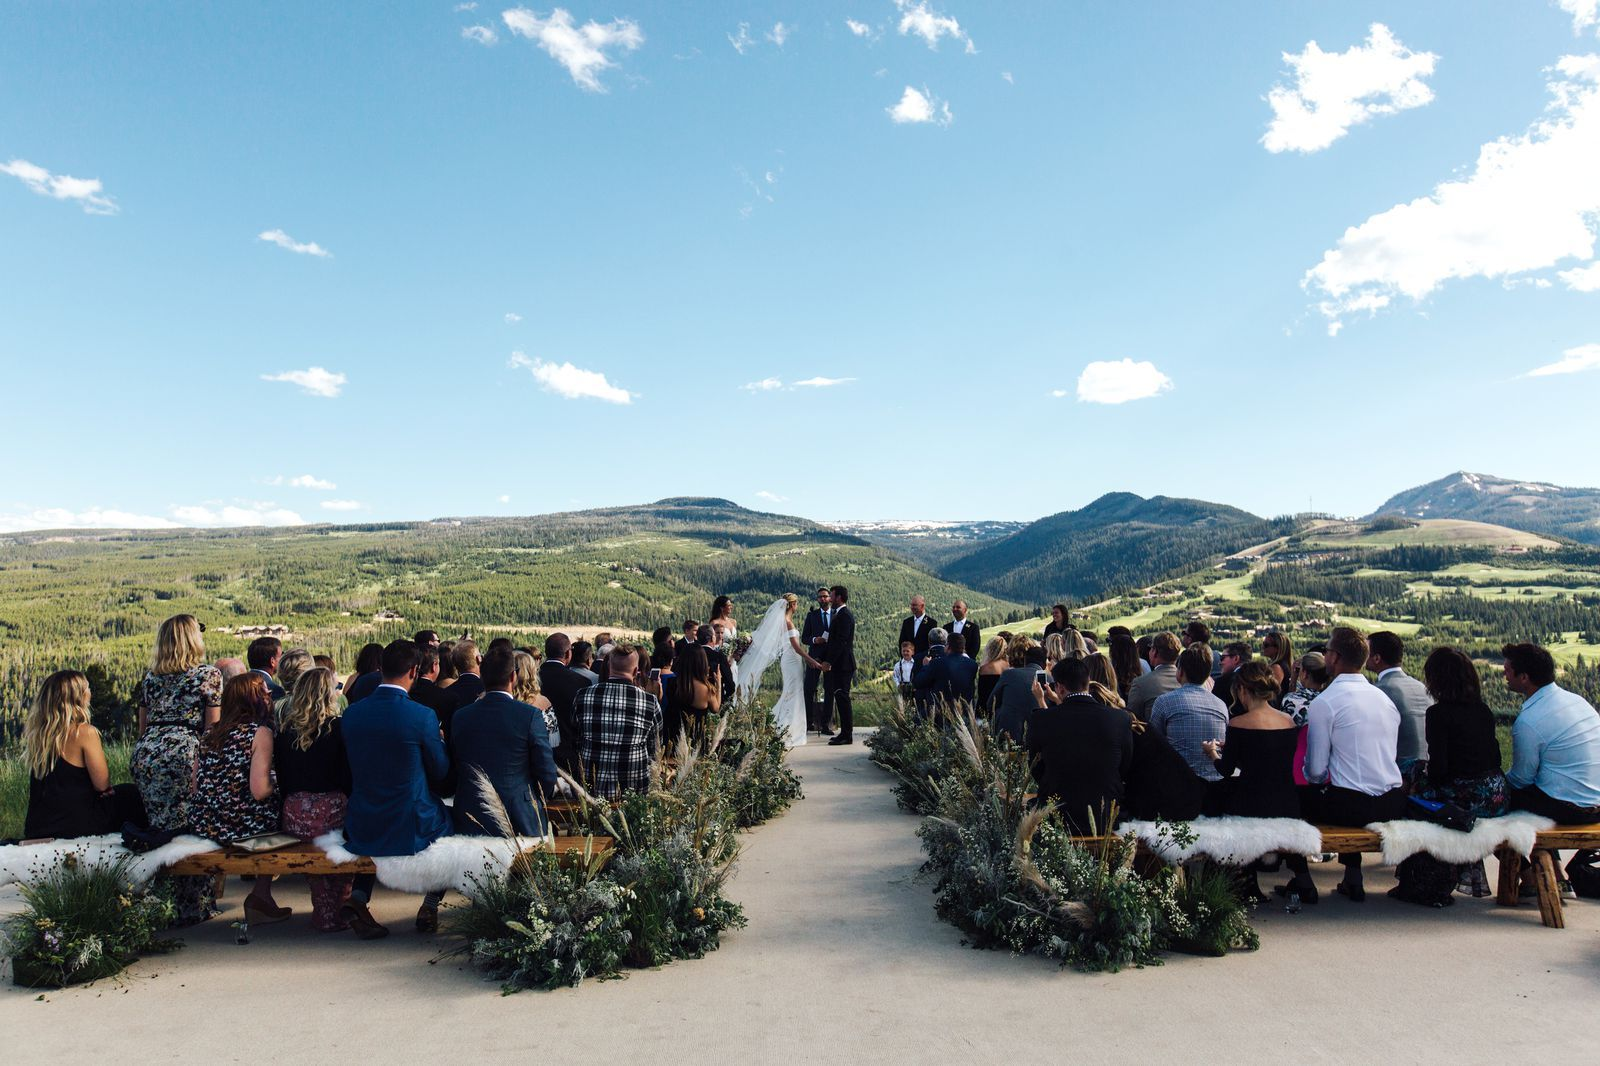 jarret stoll married